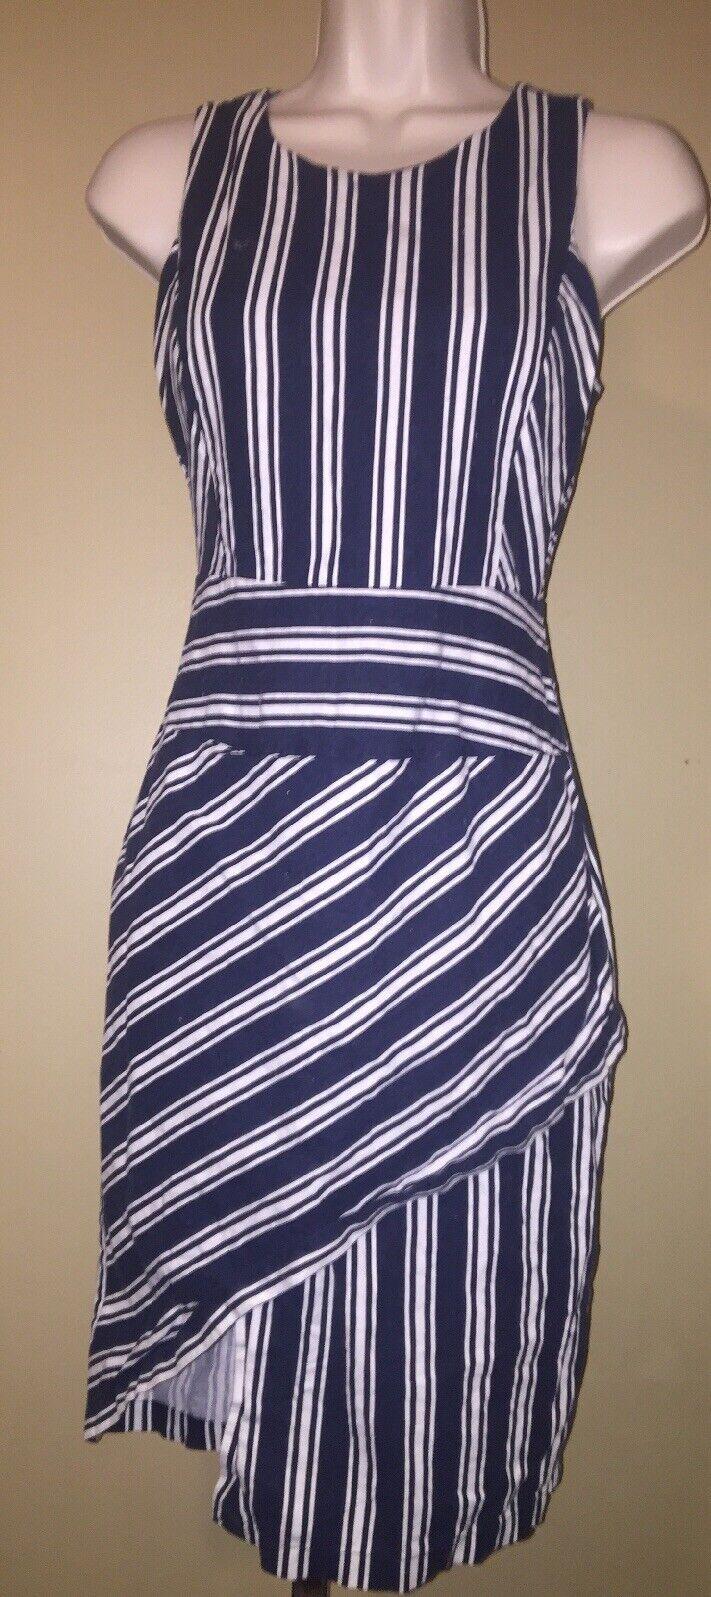 J.O.A Los angeles Linen Blend Navy White Sleevelss Striped Pencil Dress Size XS